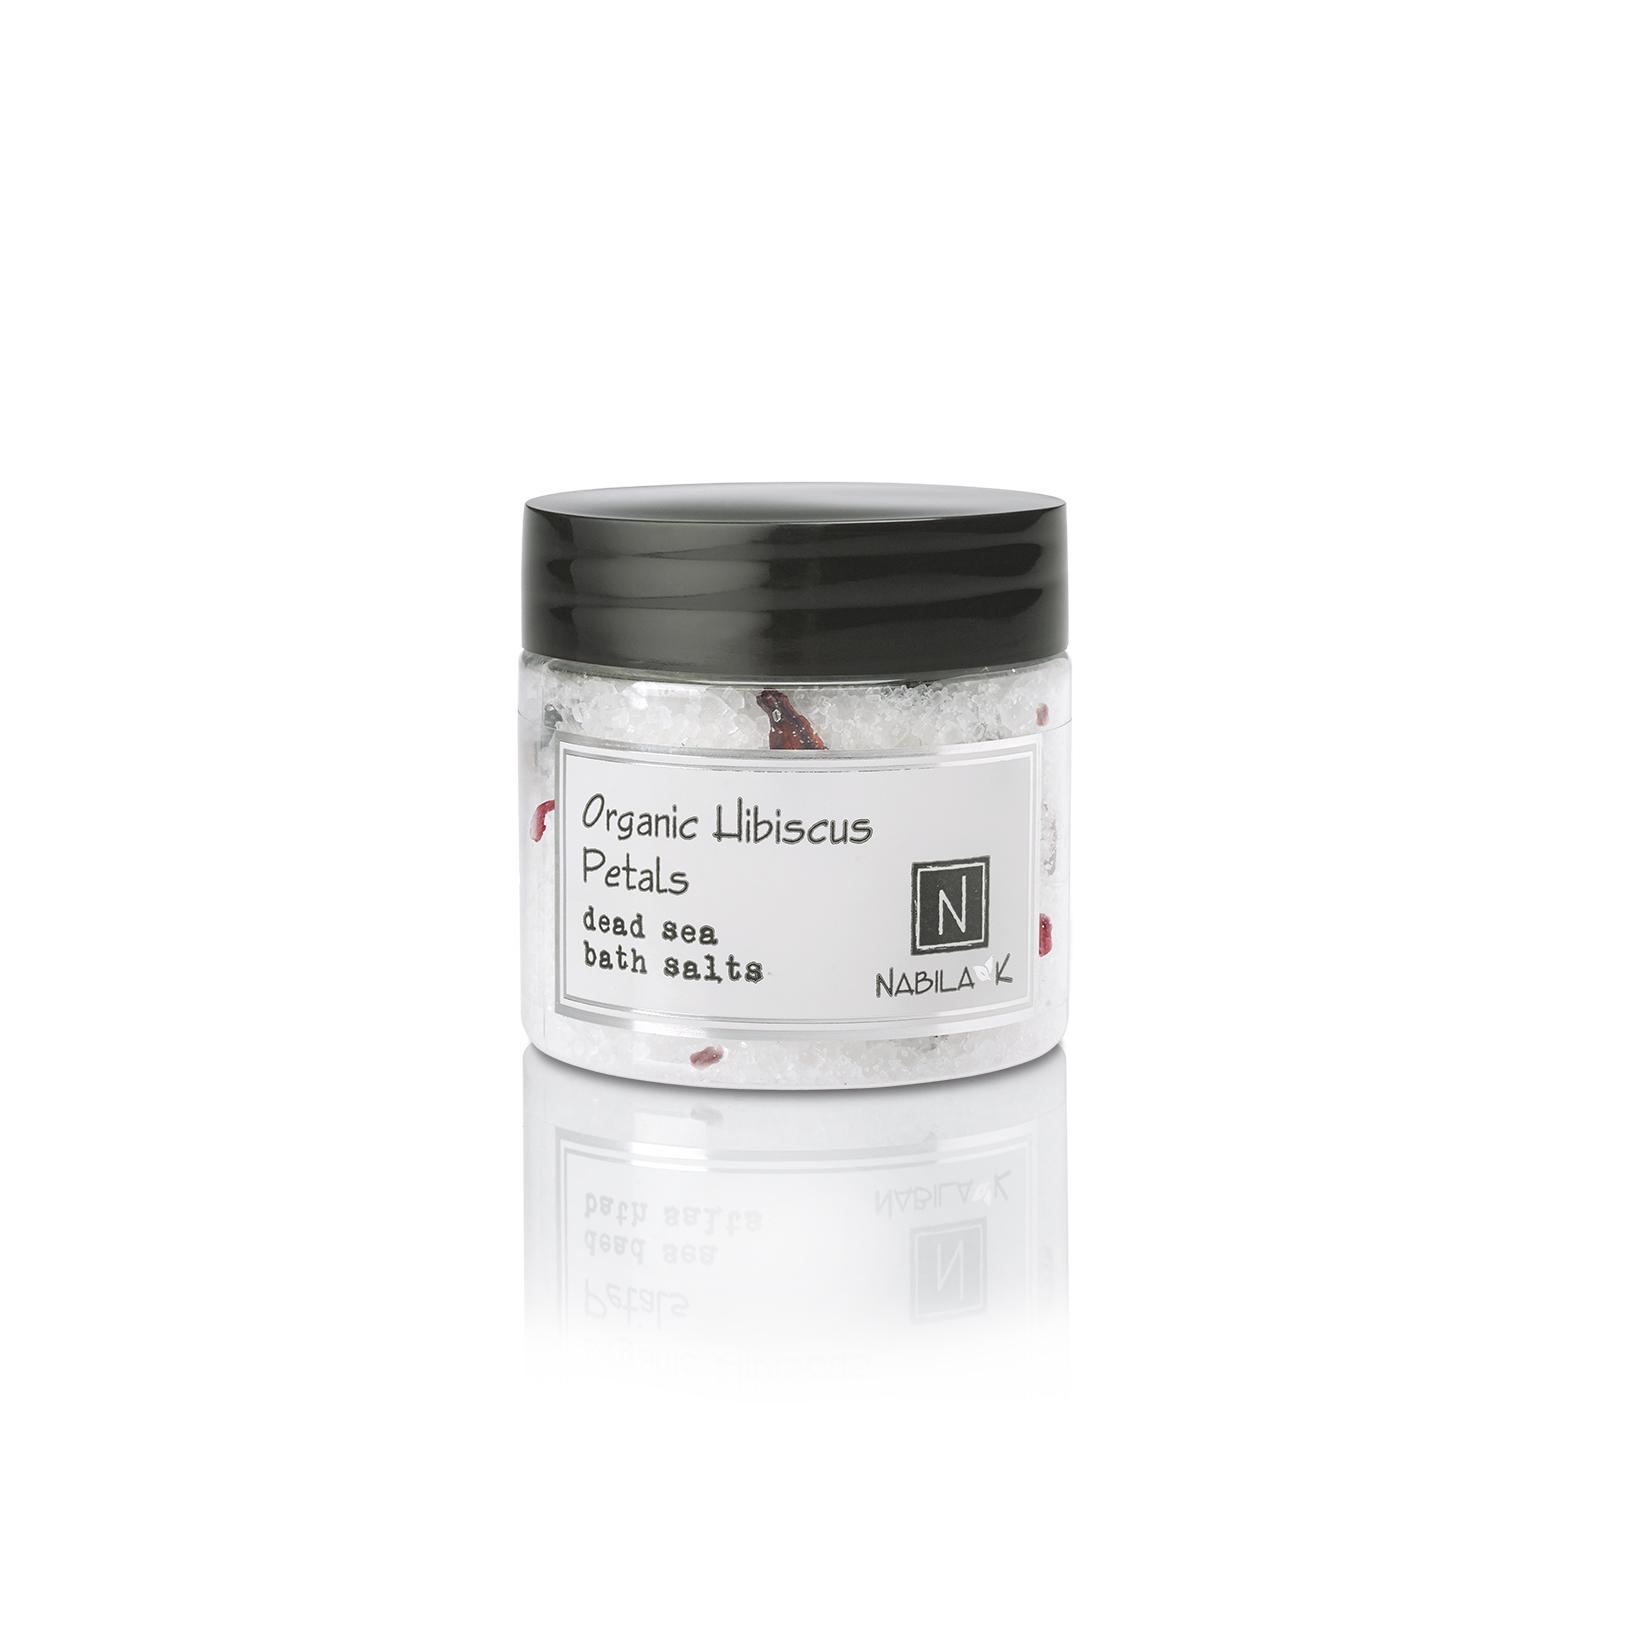 Travel Sized Version of Nabila K's Organic Hibiscus Petals Dead Sea Bath Salts